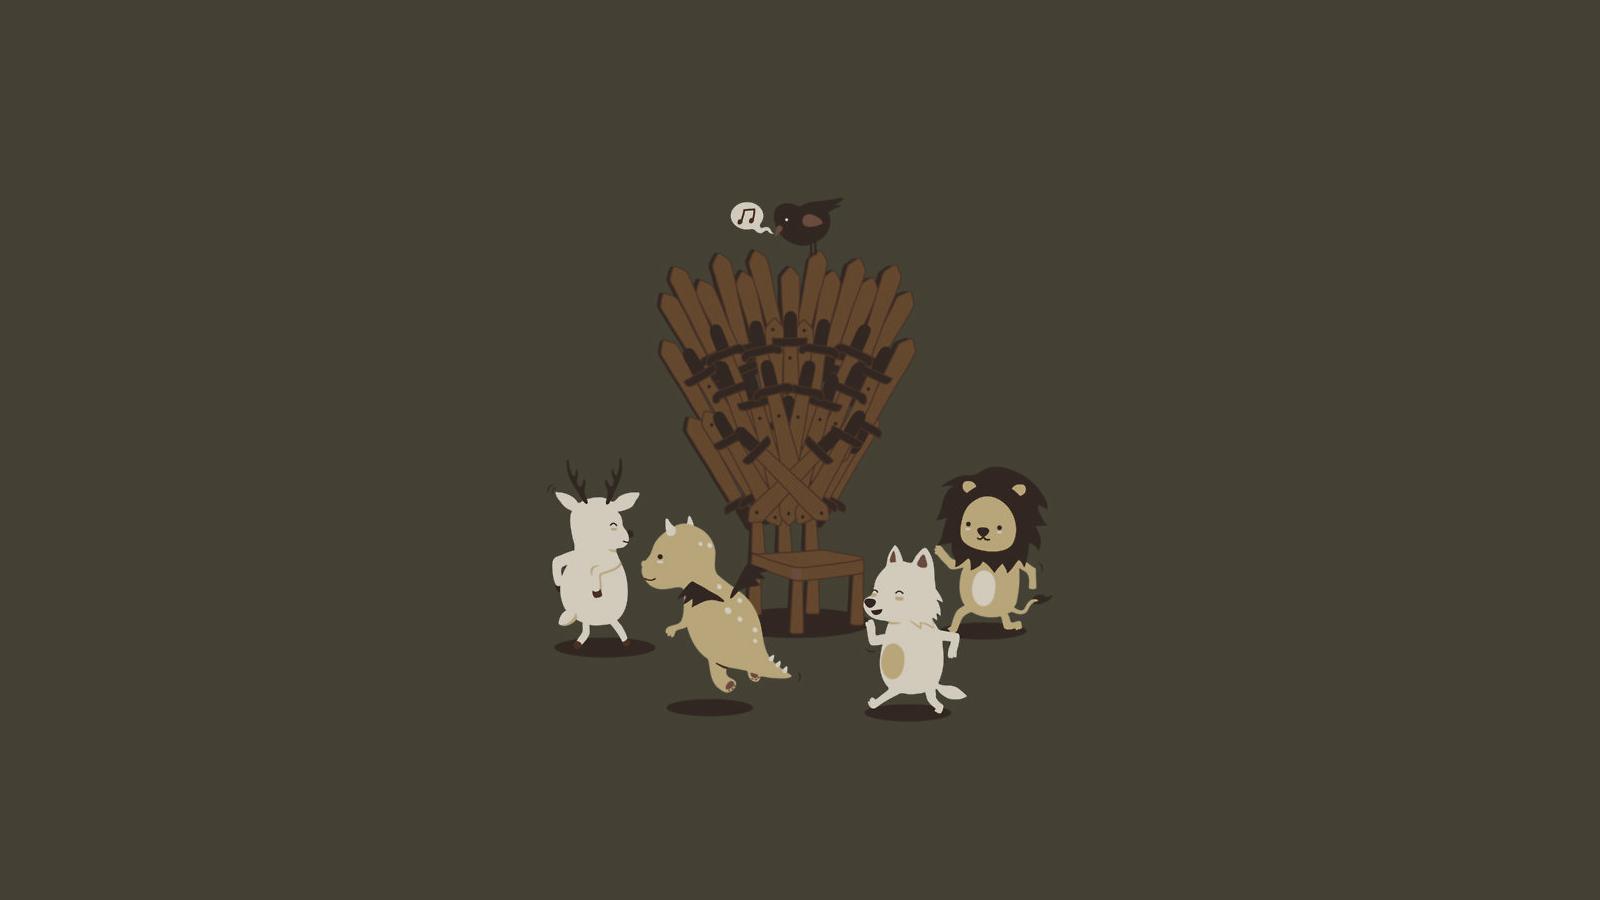 Game Of Thrones Minimalist Wallpaper Star